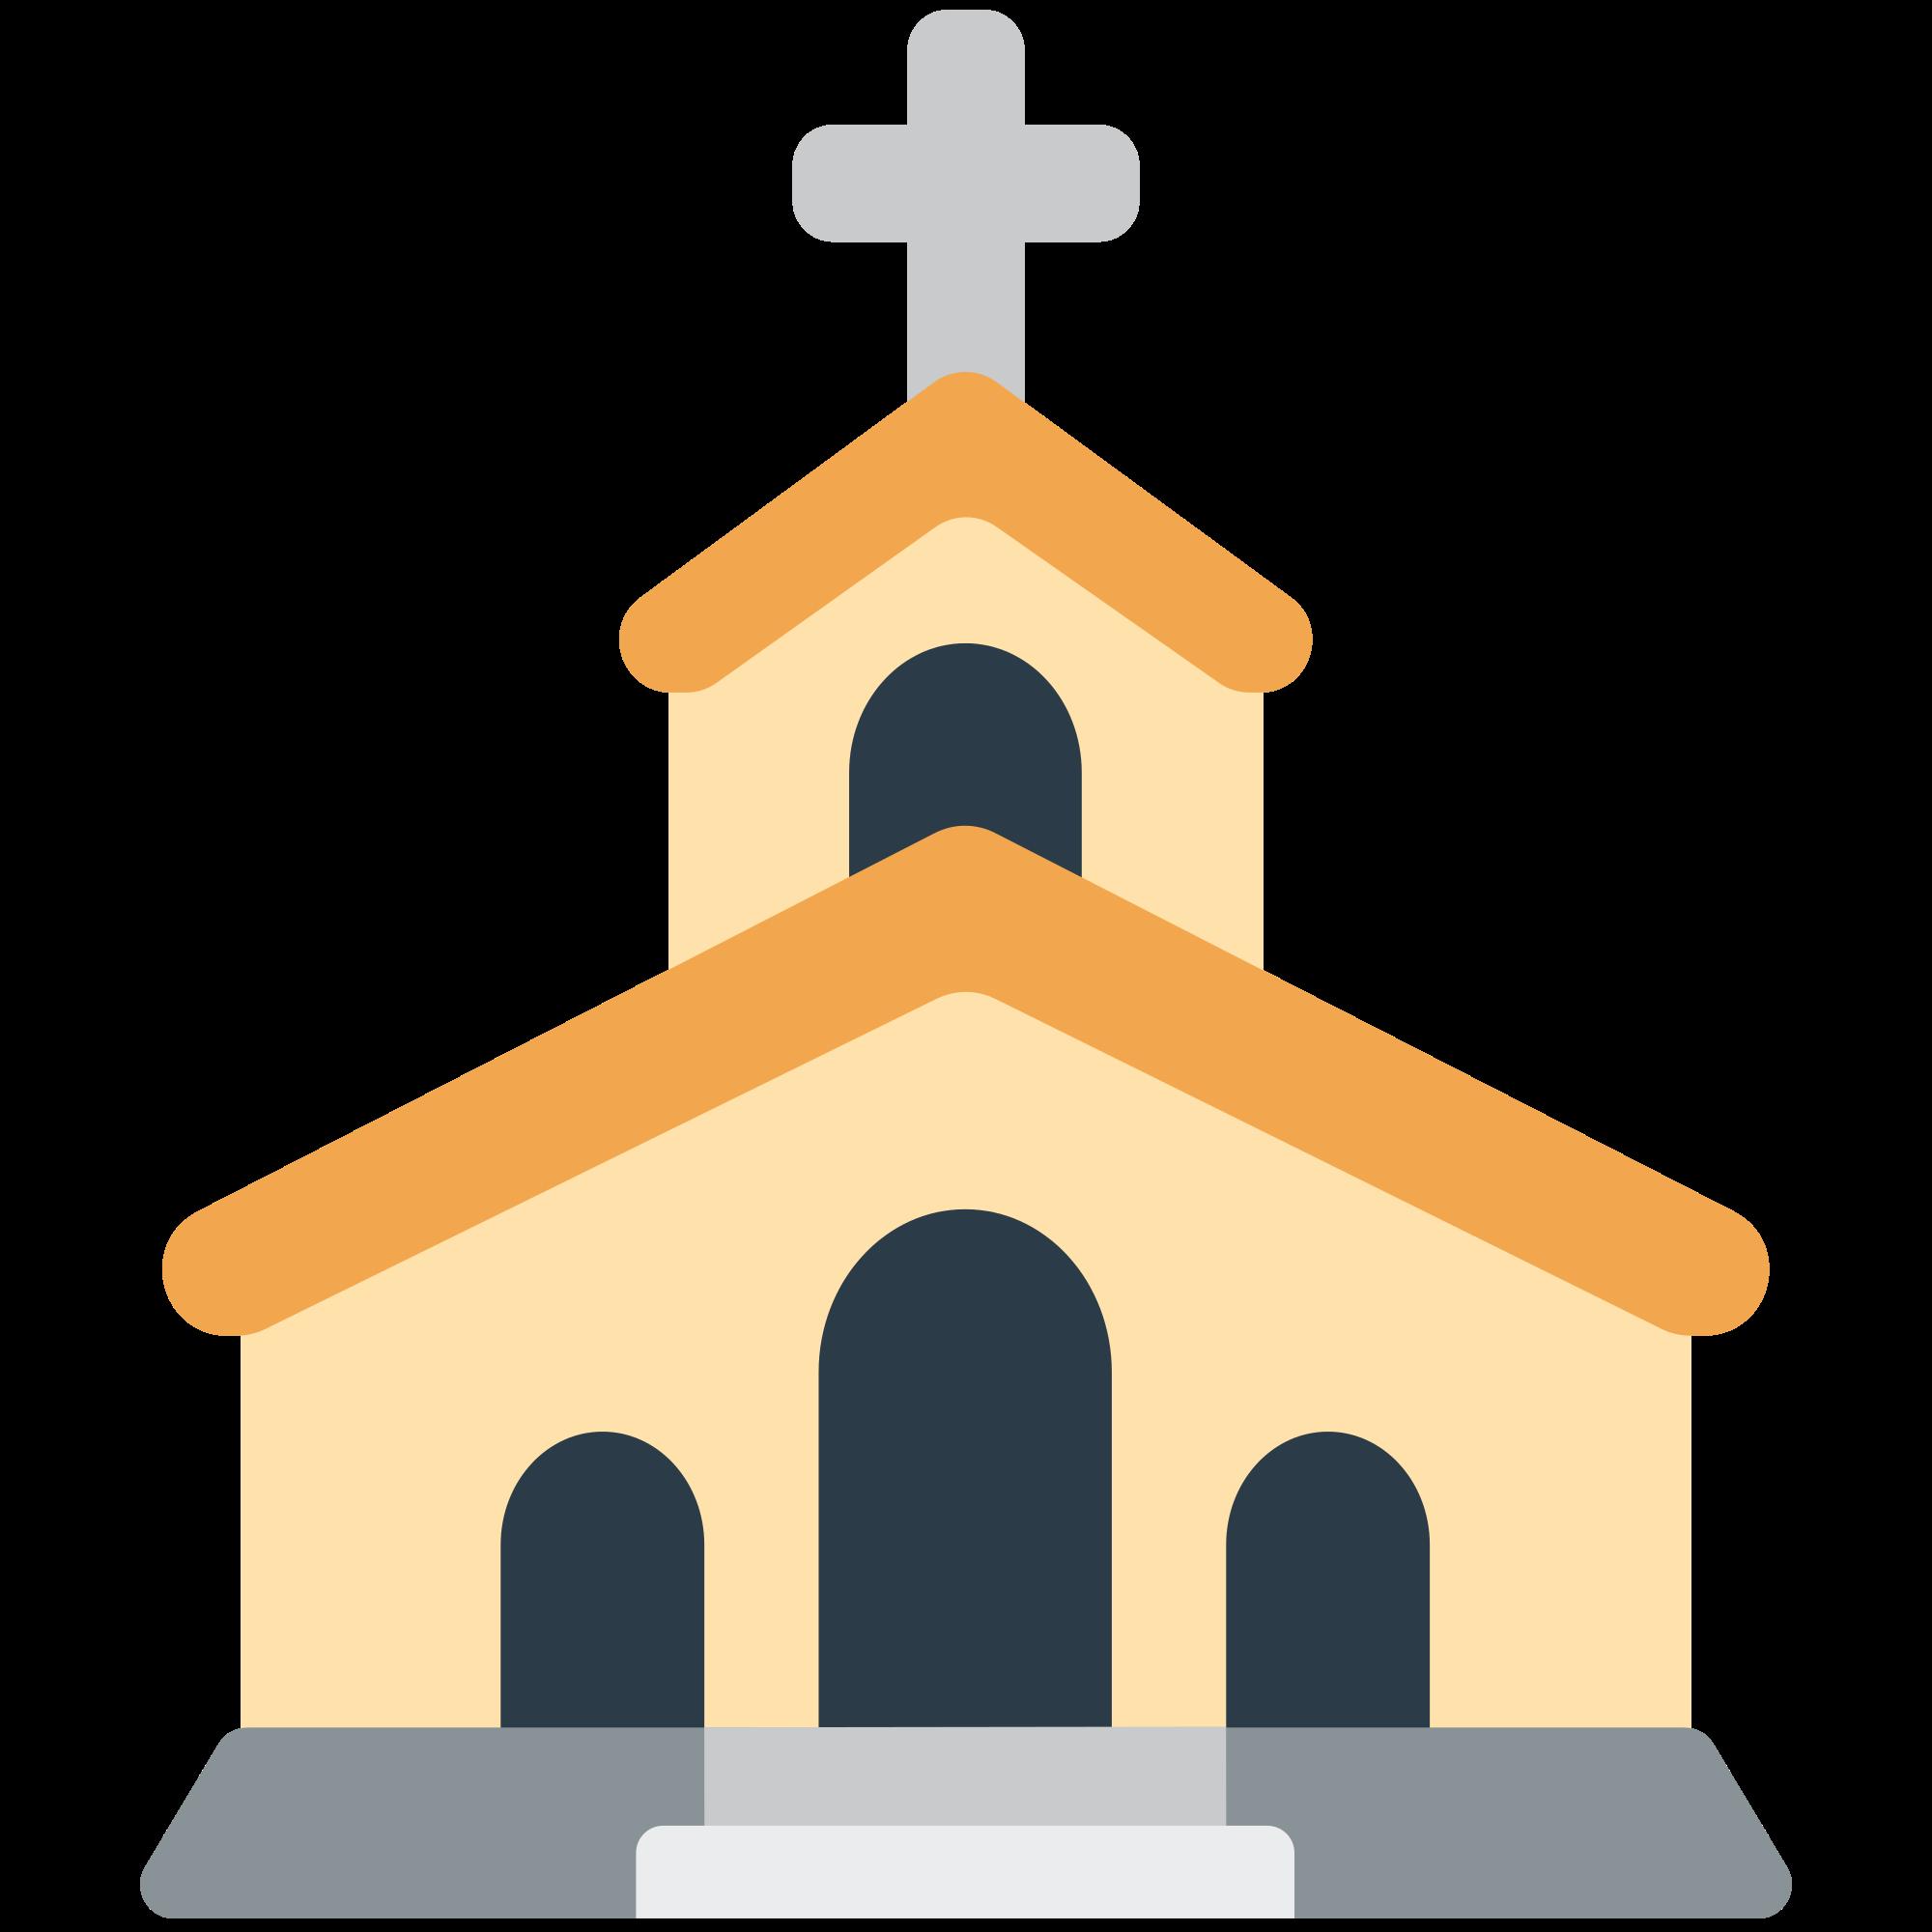 Church open house clipart clipart library download File:Fxemoji u26EA.svg - Wikimedia Commons clipart library download